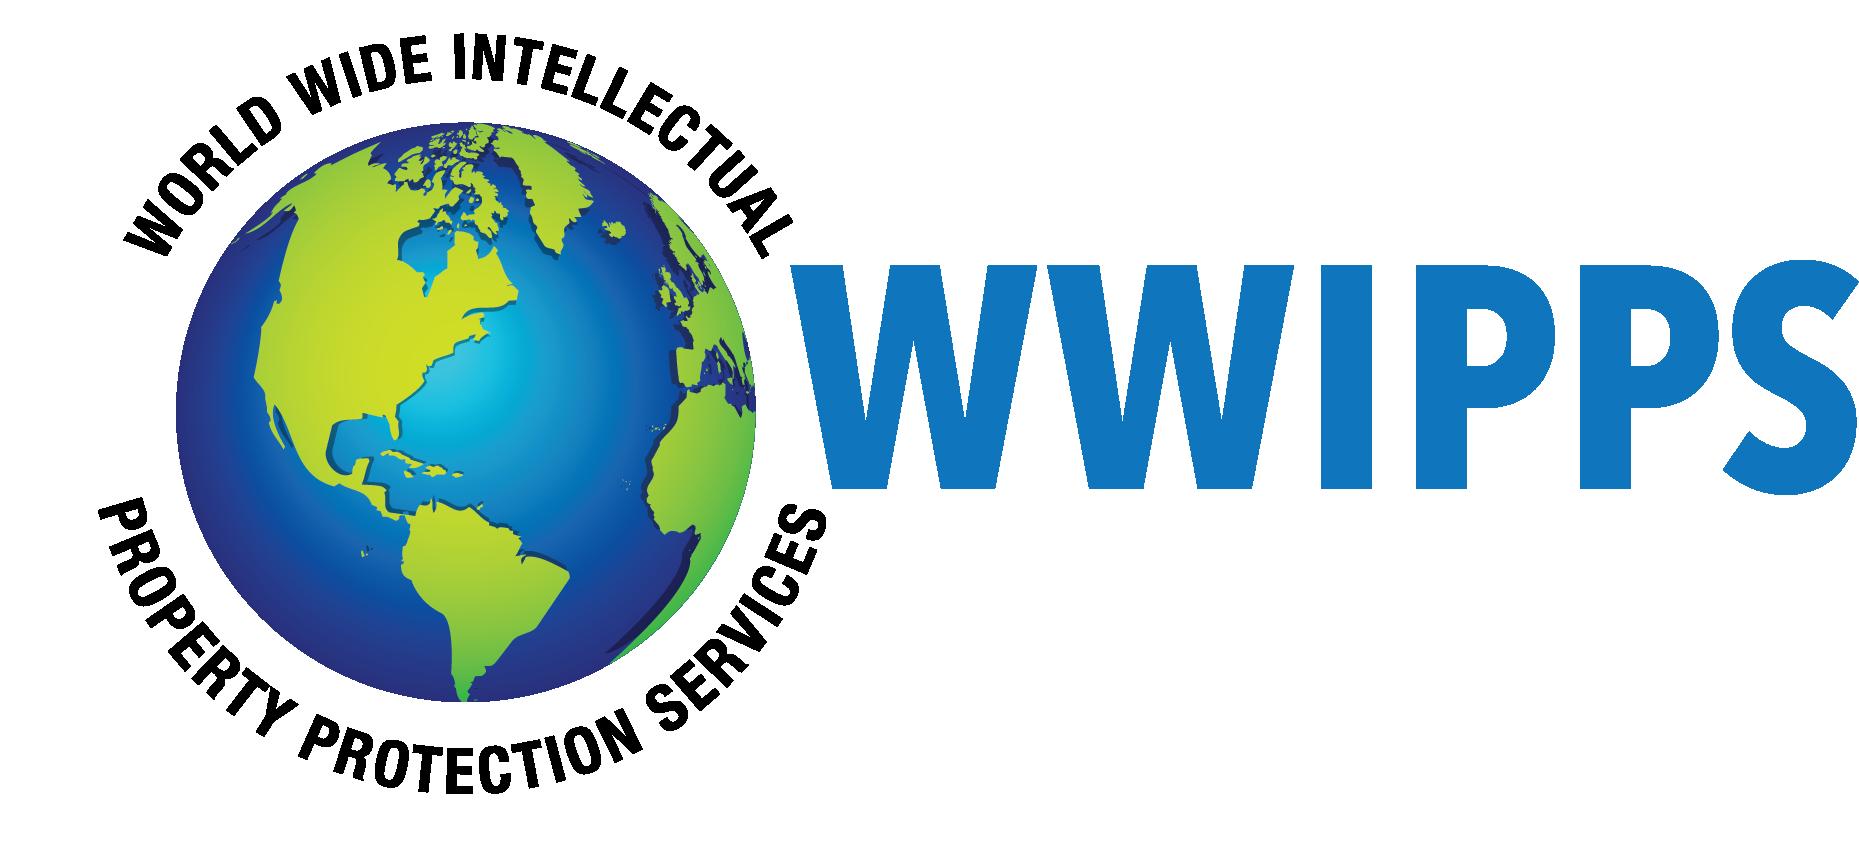 WWIPPS